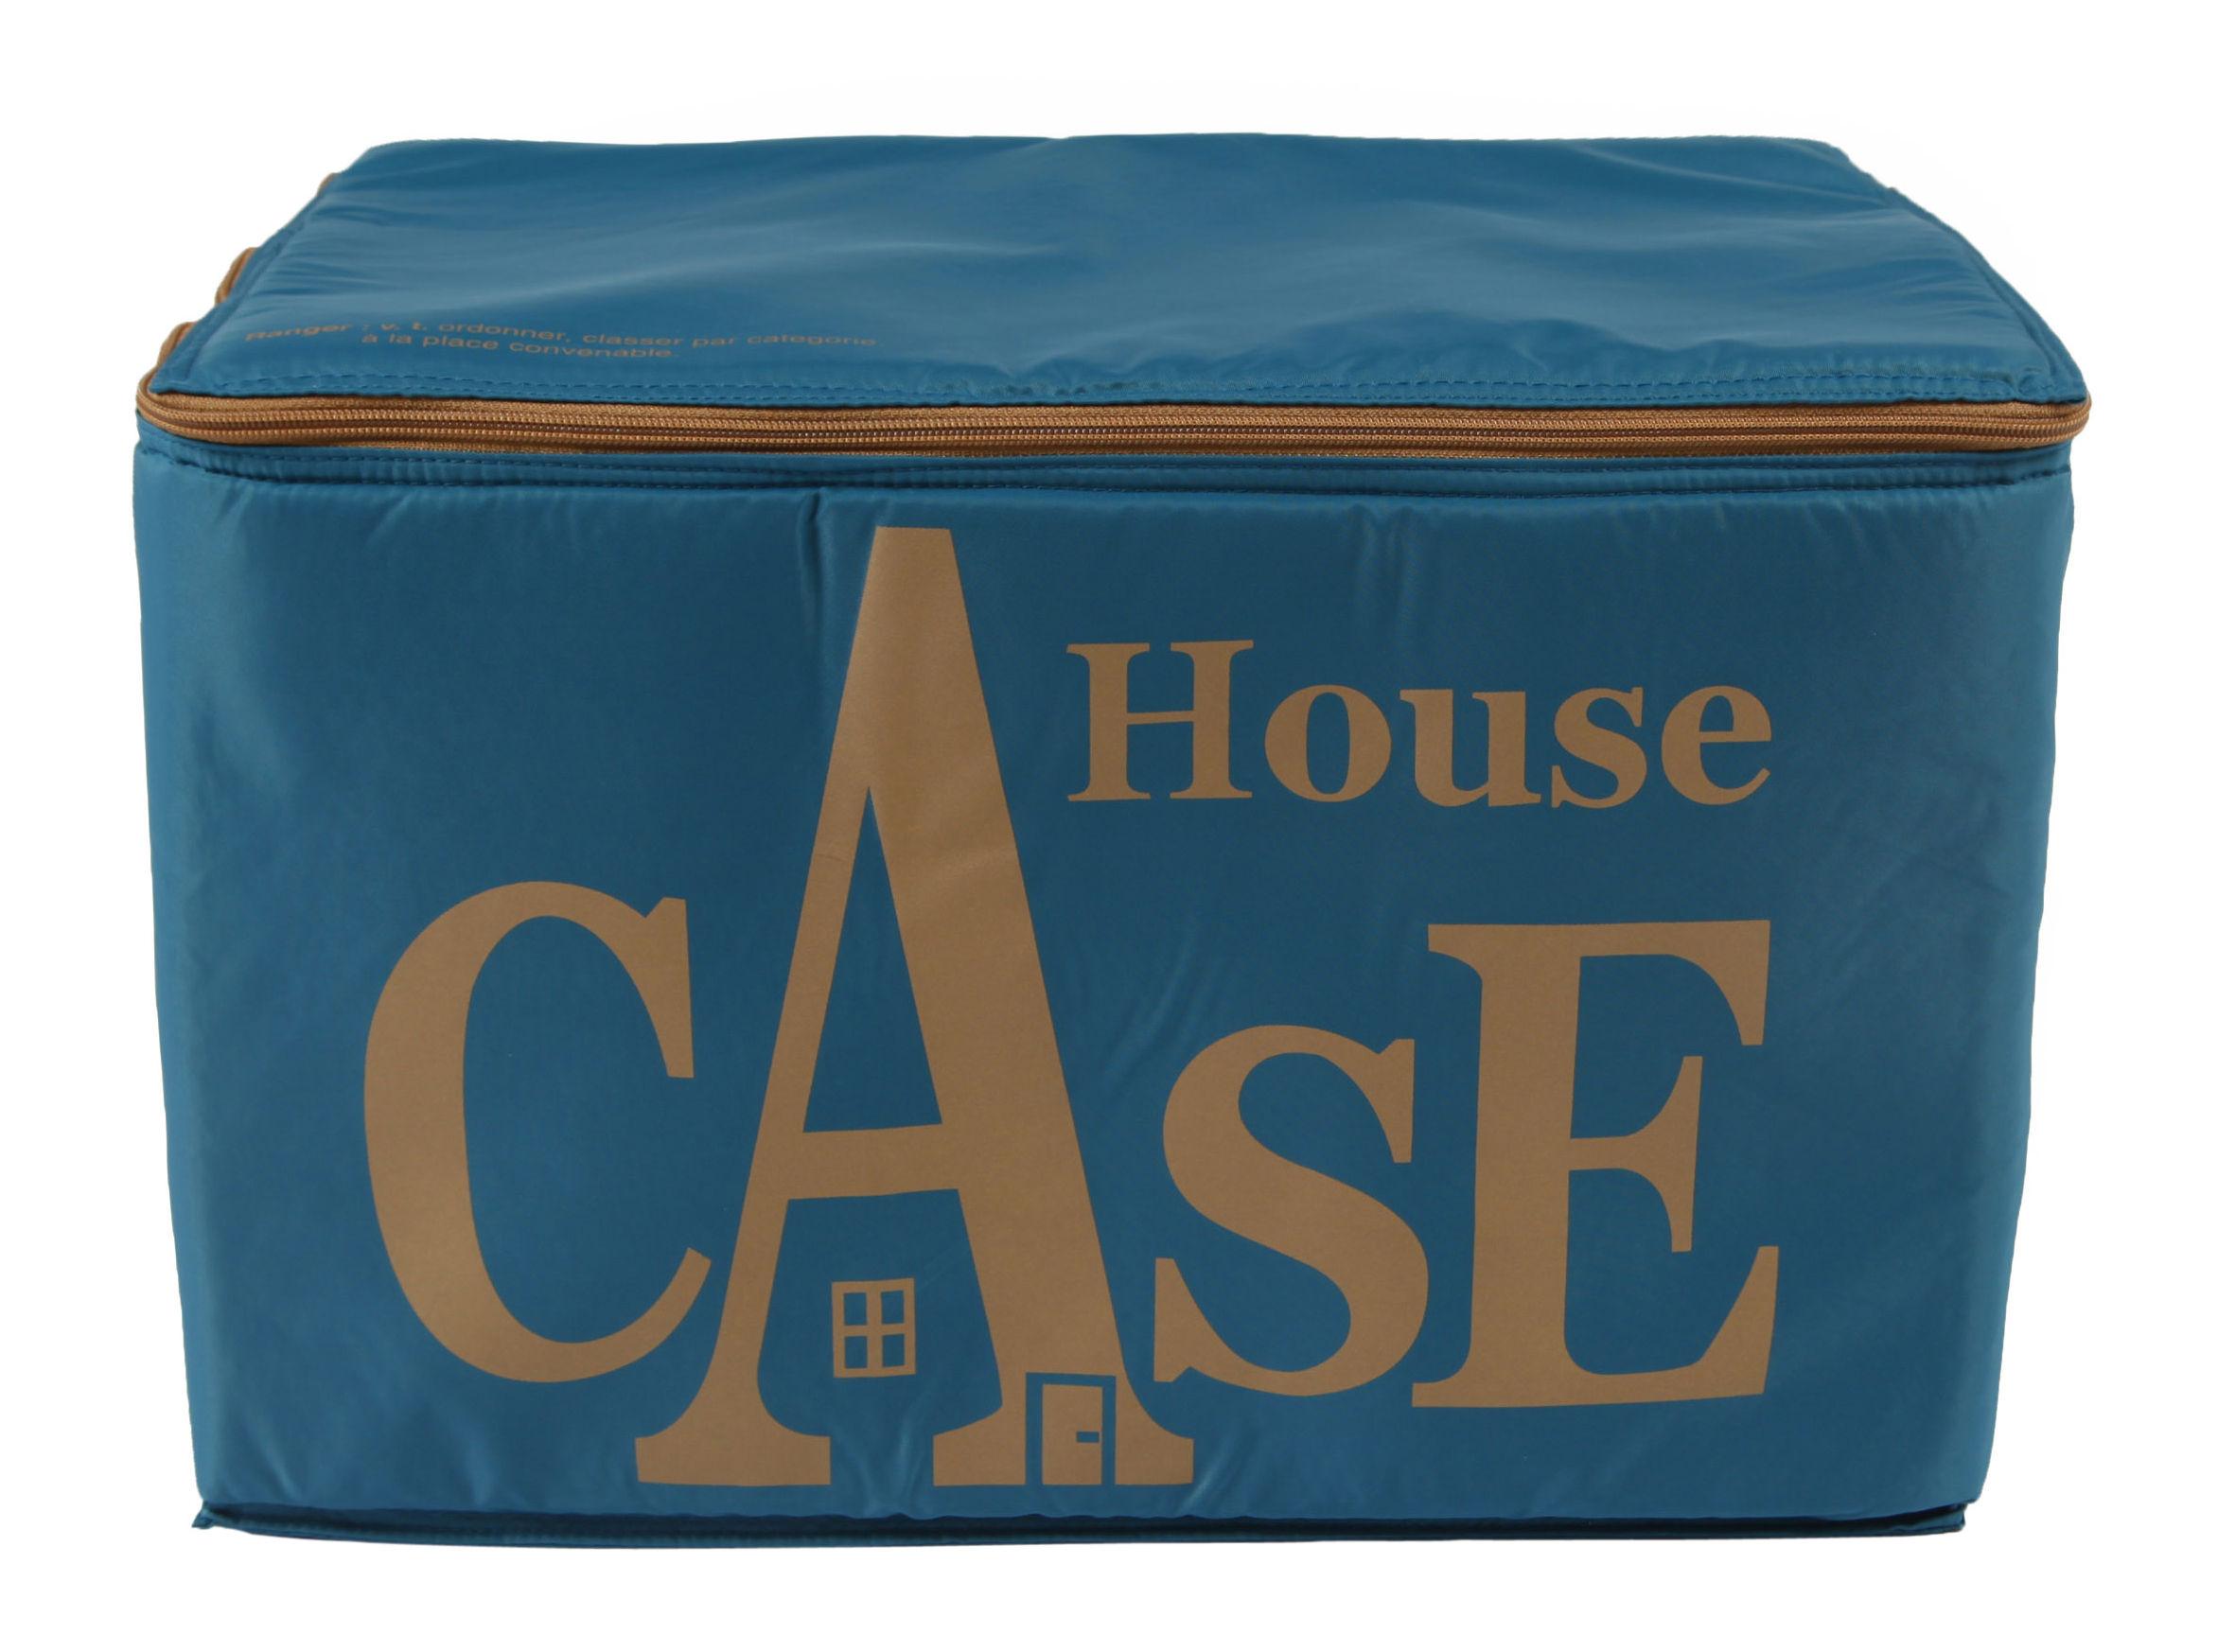 rangement house case medium turquoise bensimon. Black Bedroom Furniture Sets. Home Design Ideas